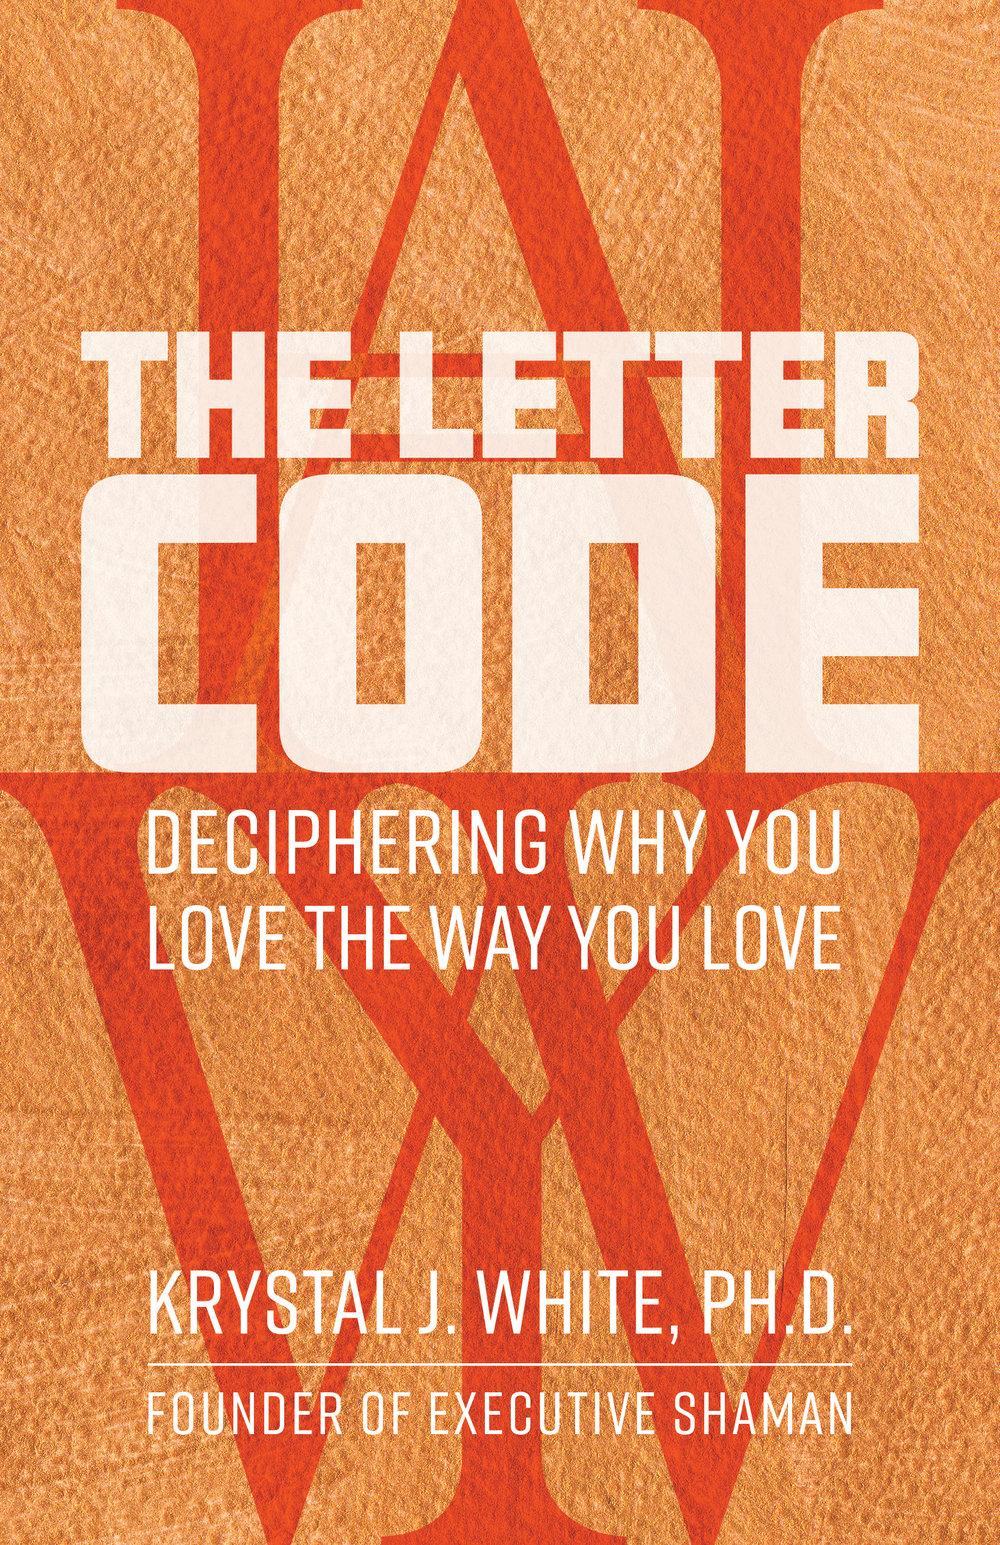 LetterCode_Kindle.jpg